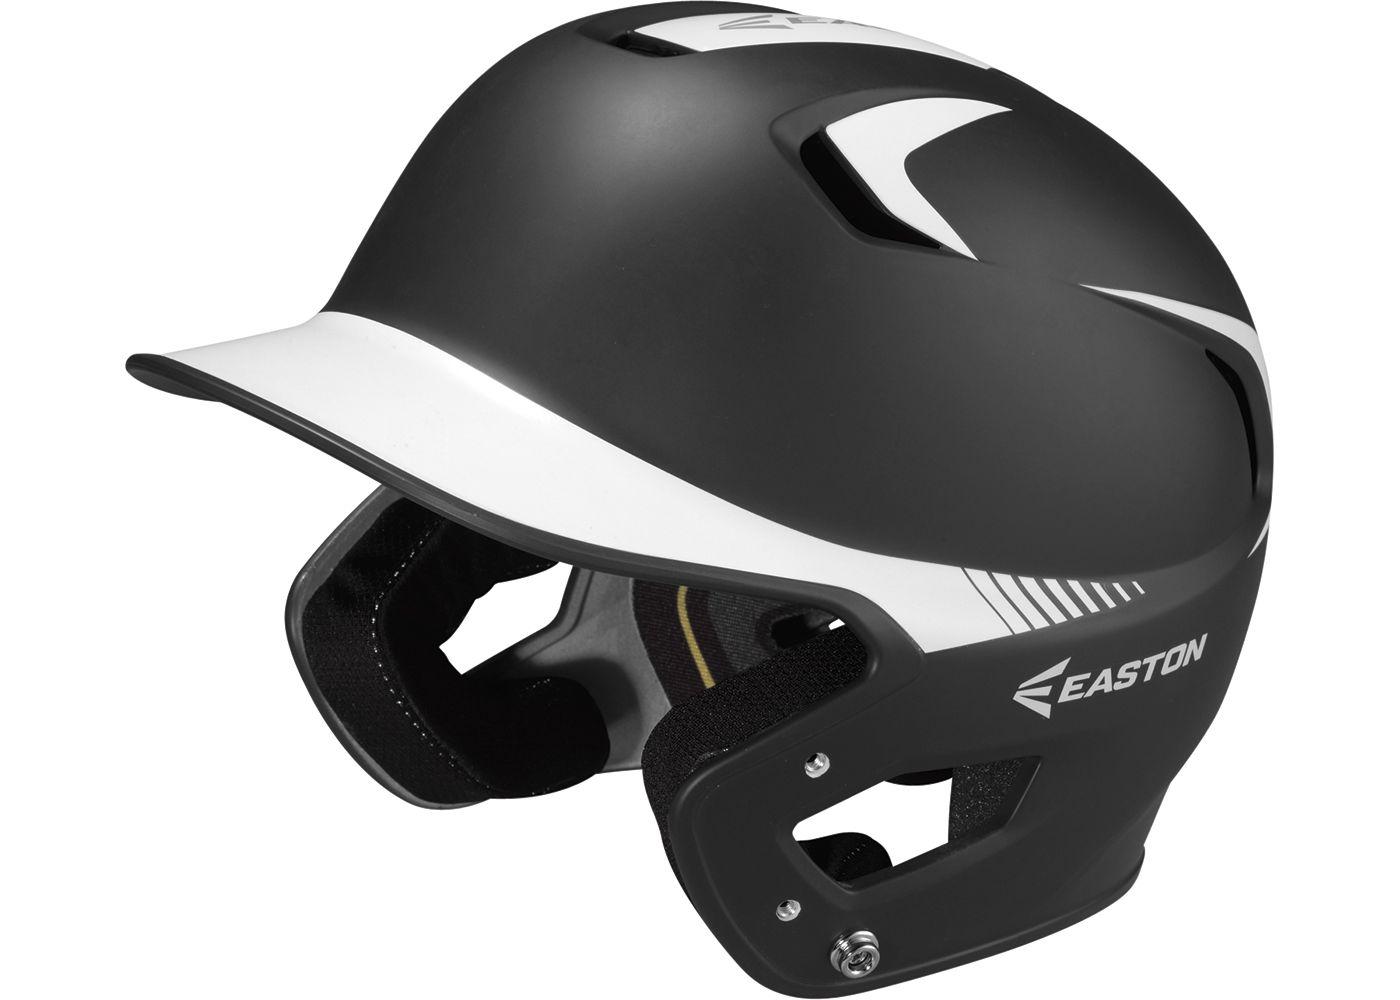 Easton Junior Z5 Grip Two-Tone Batting Helmet